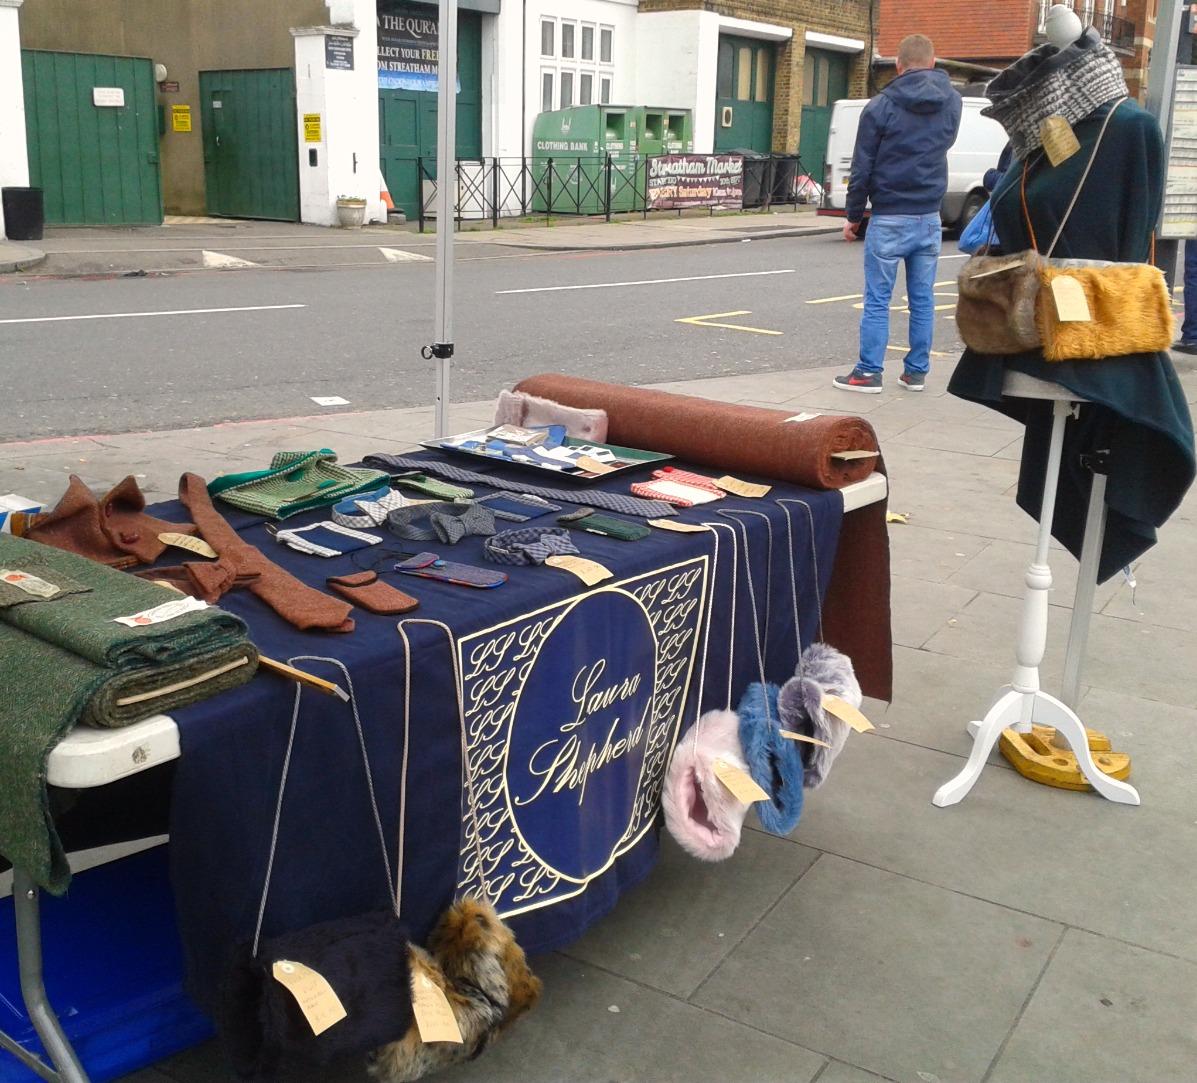 Streatham Market